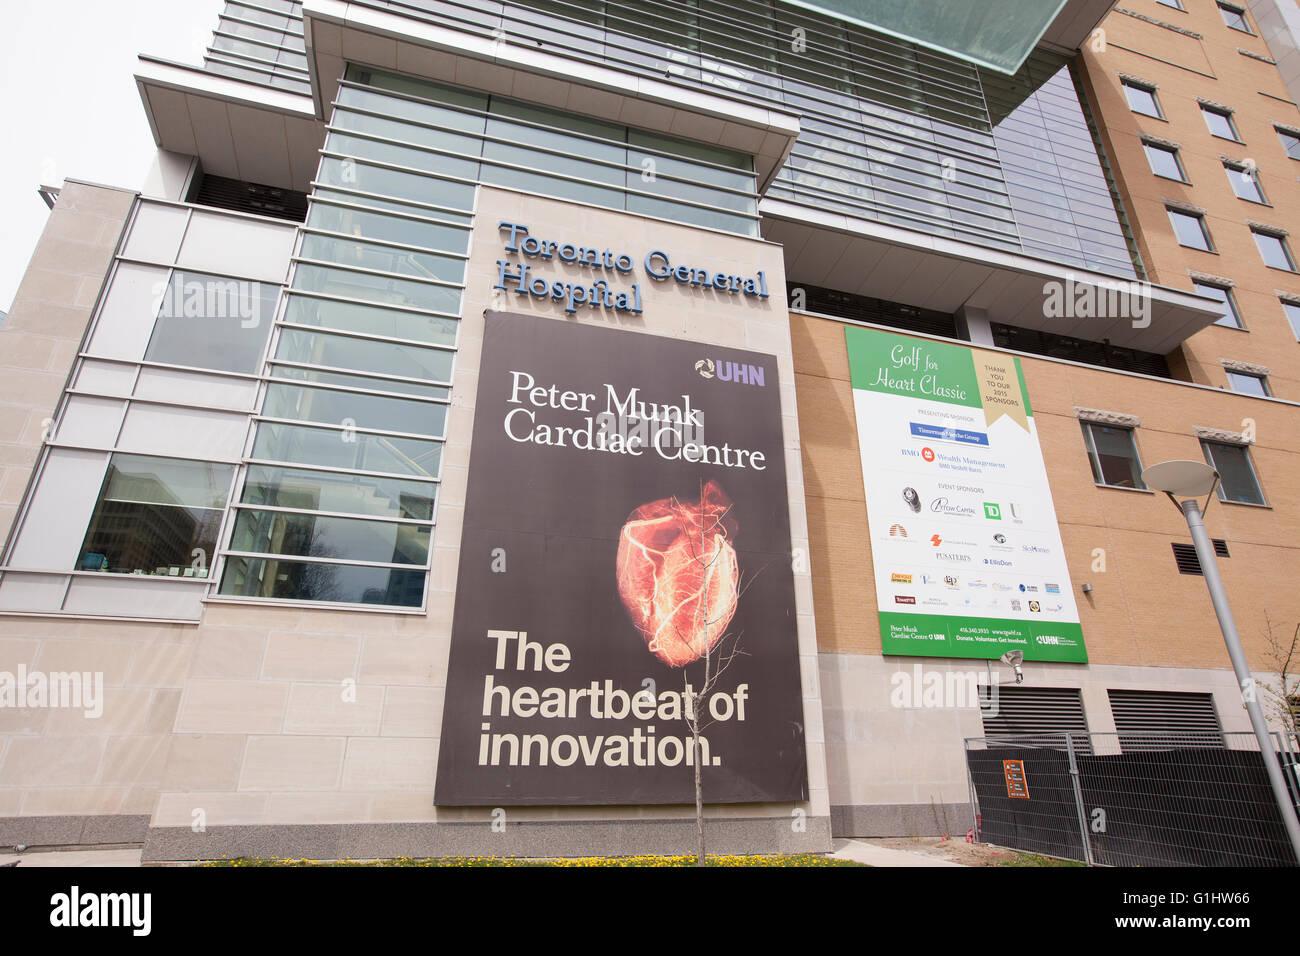 TORONTO - APRIL 28, 2016: Peter Munk Cardiac Center at The Toronto General Hospital, is a major teaching hospital - Stock Image